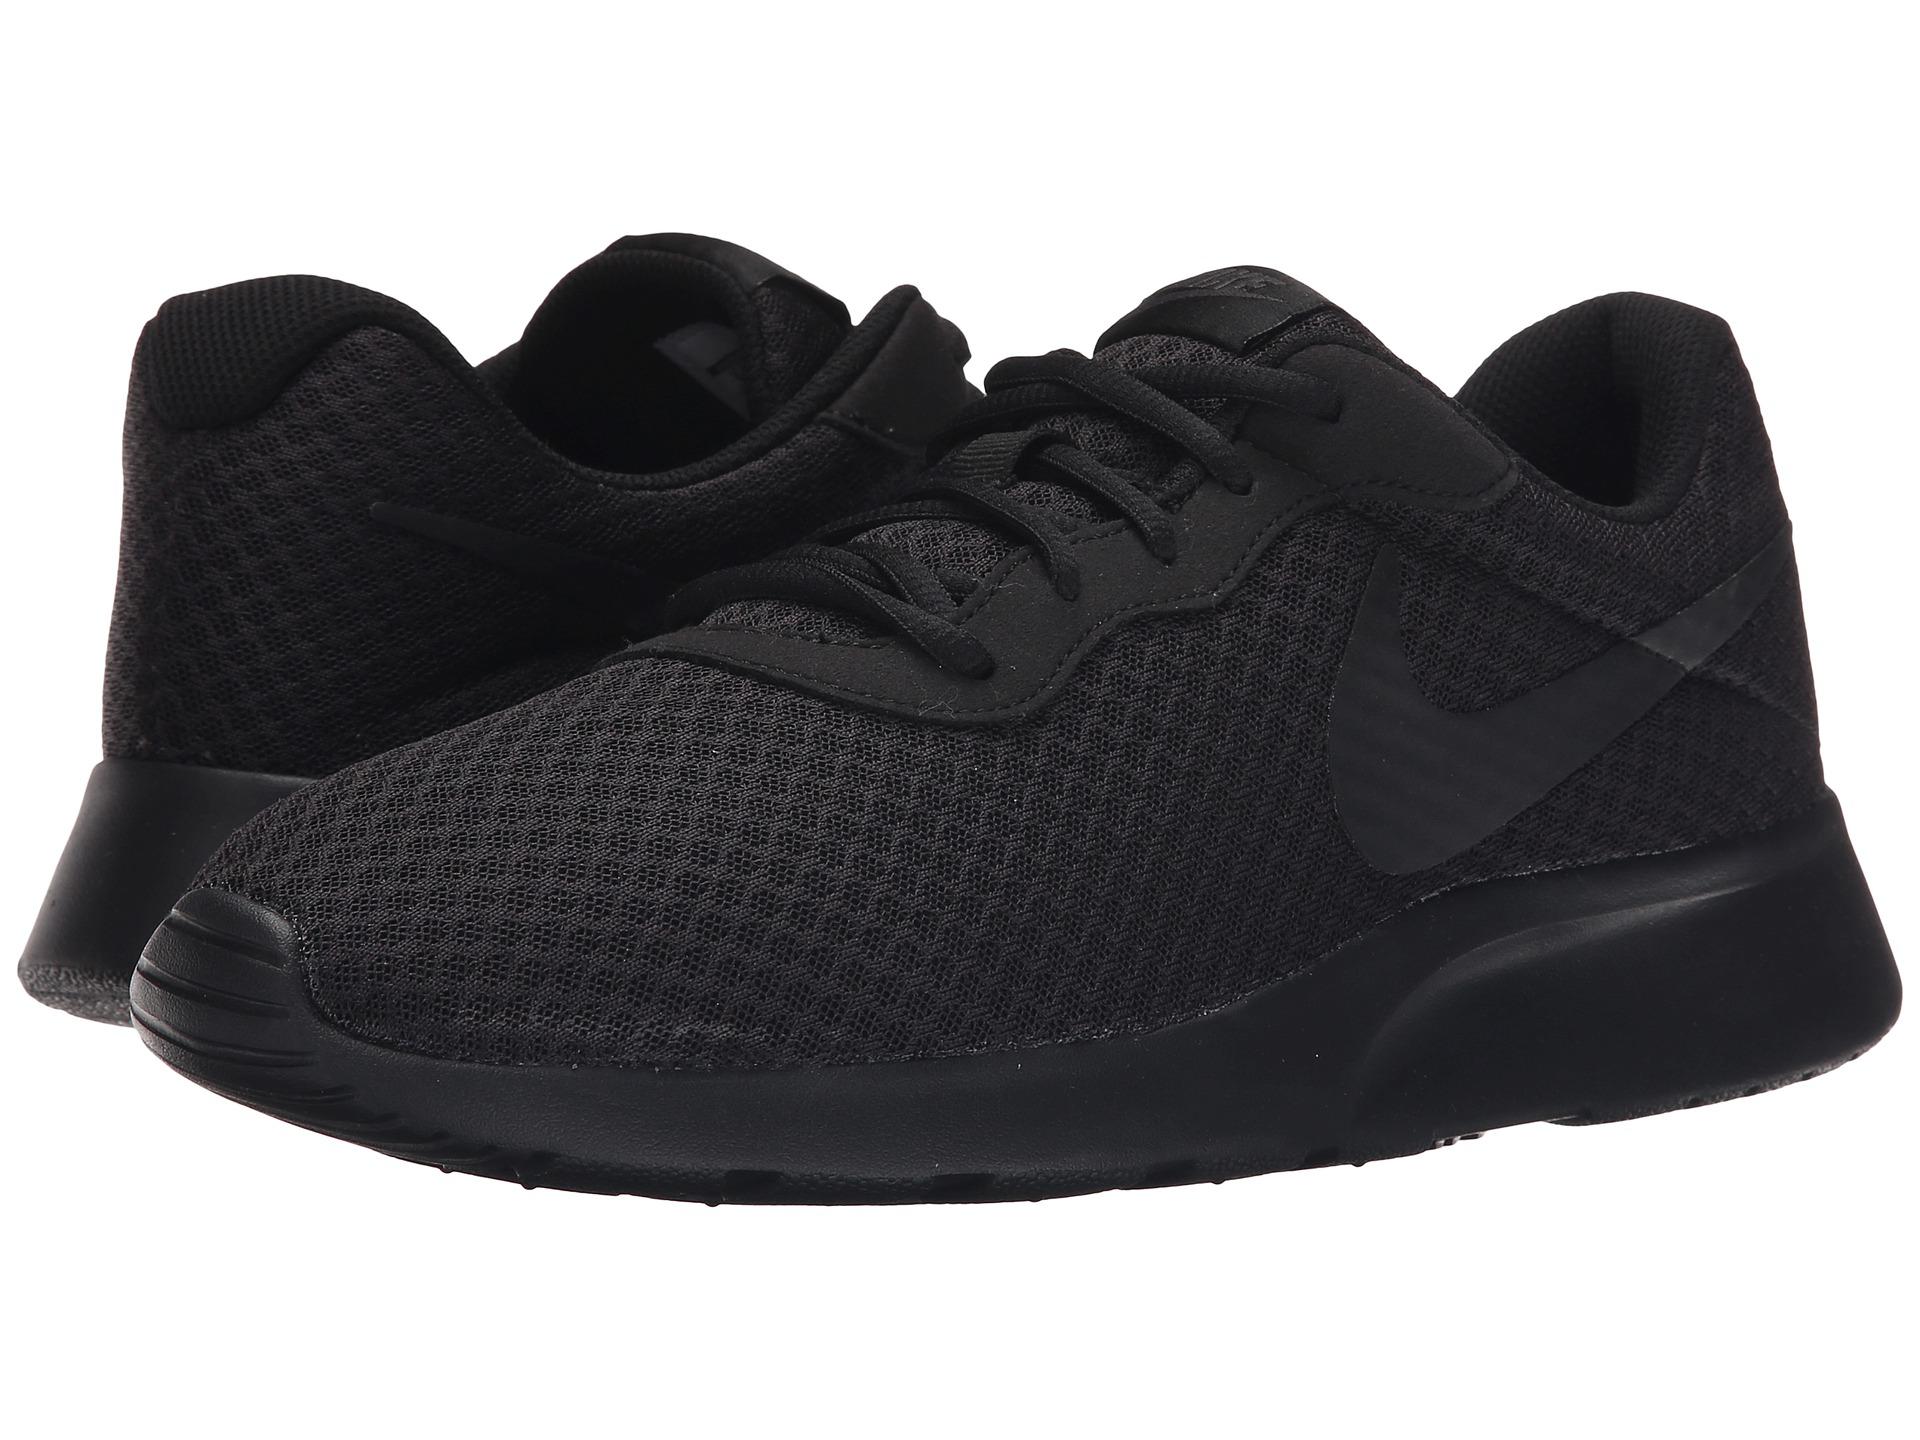 Nike Tanjun Women S Athletic Shoes Sale